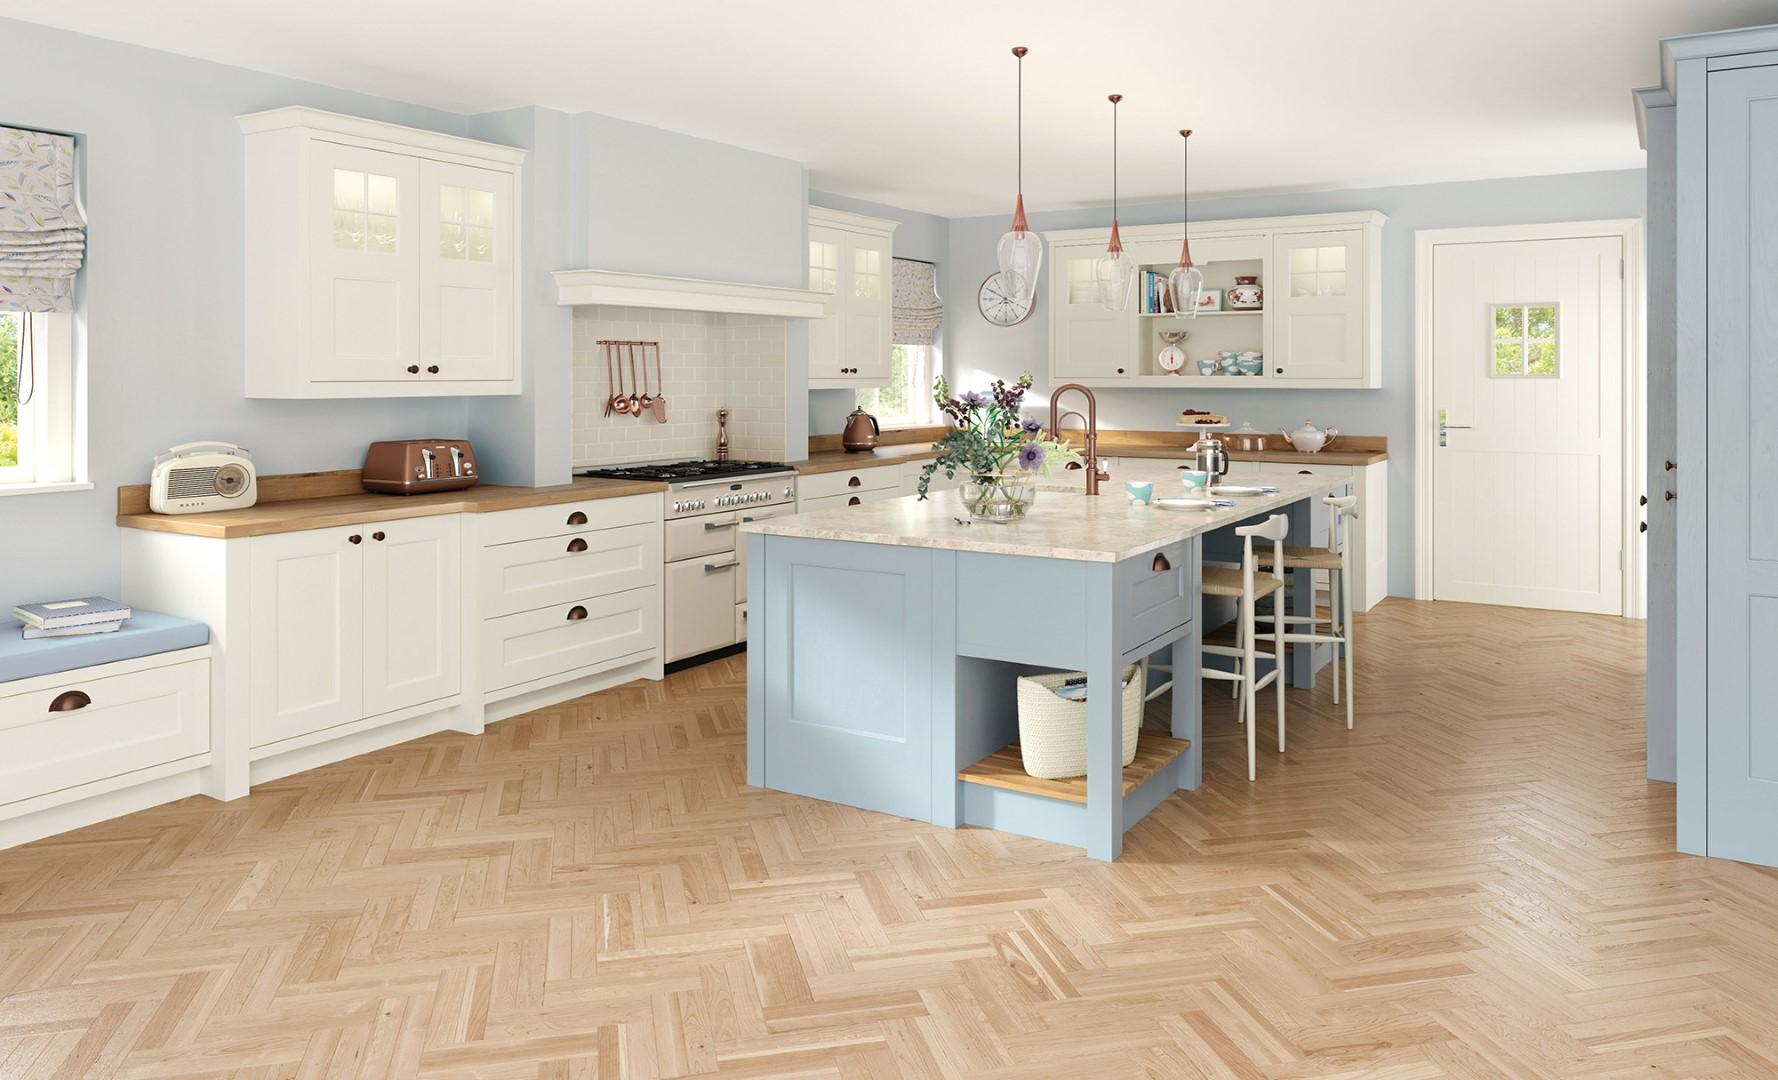 Wakefield Porcelain Pantry Blue Kitchen - Kitchen Design - Alan Kelly Kitchens - Waterford